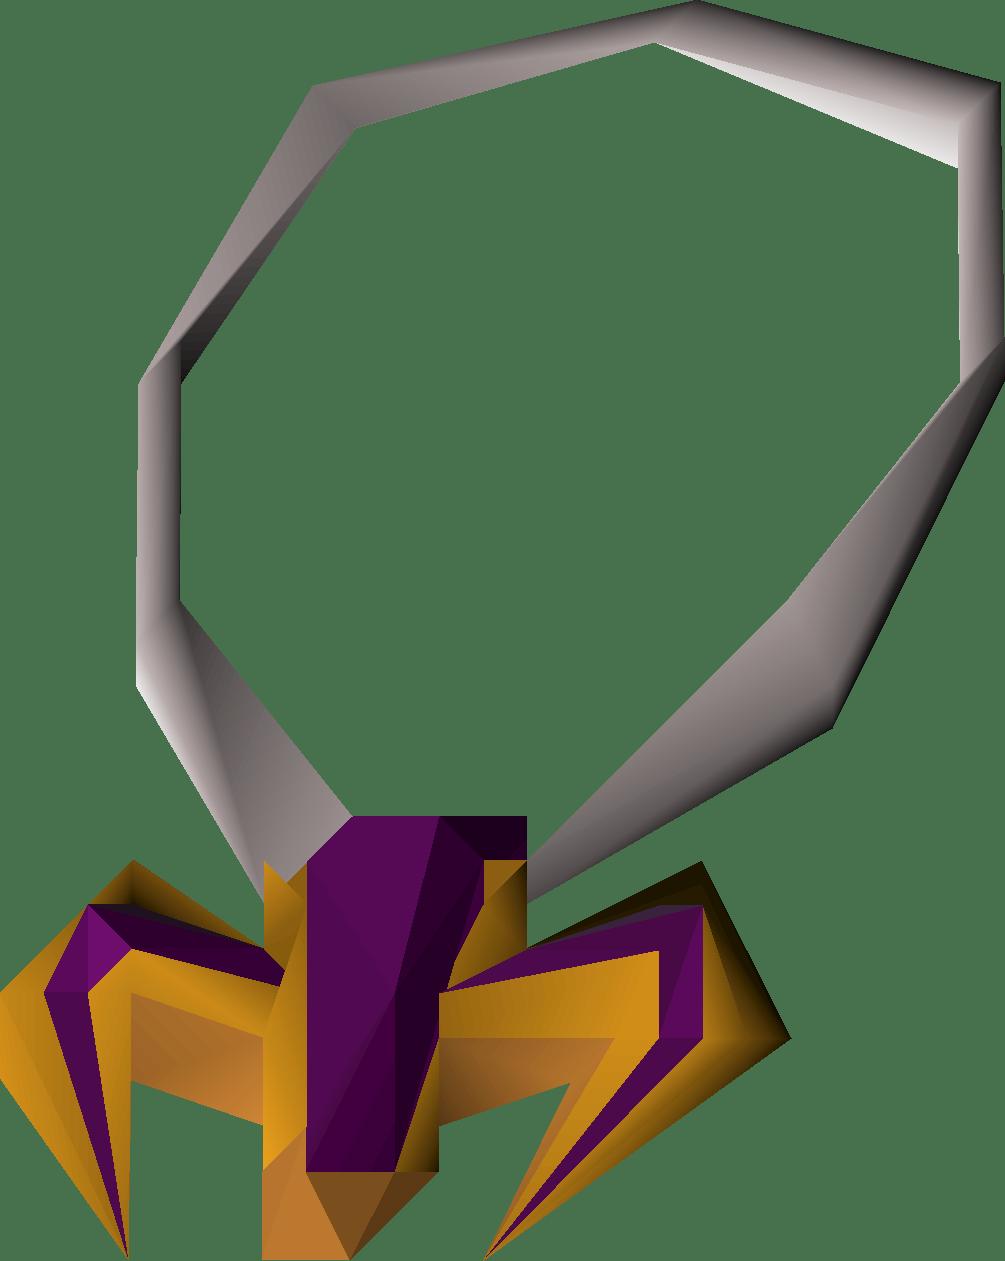 Osrs Dragonstone Amulet : dragonstone, amulet, Amulet, Glory